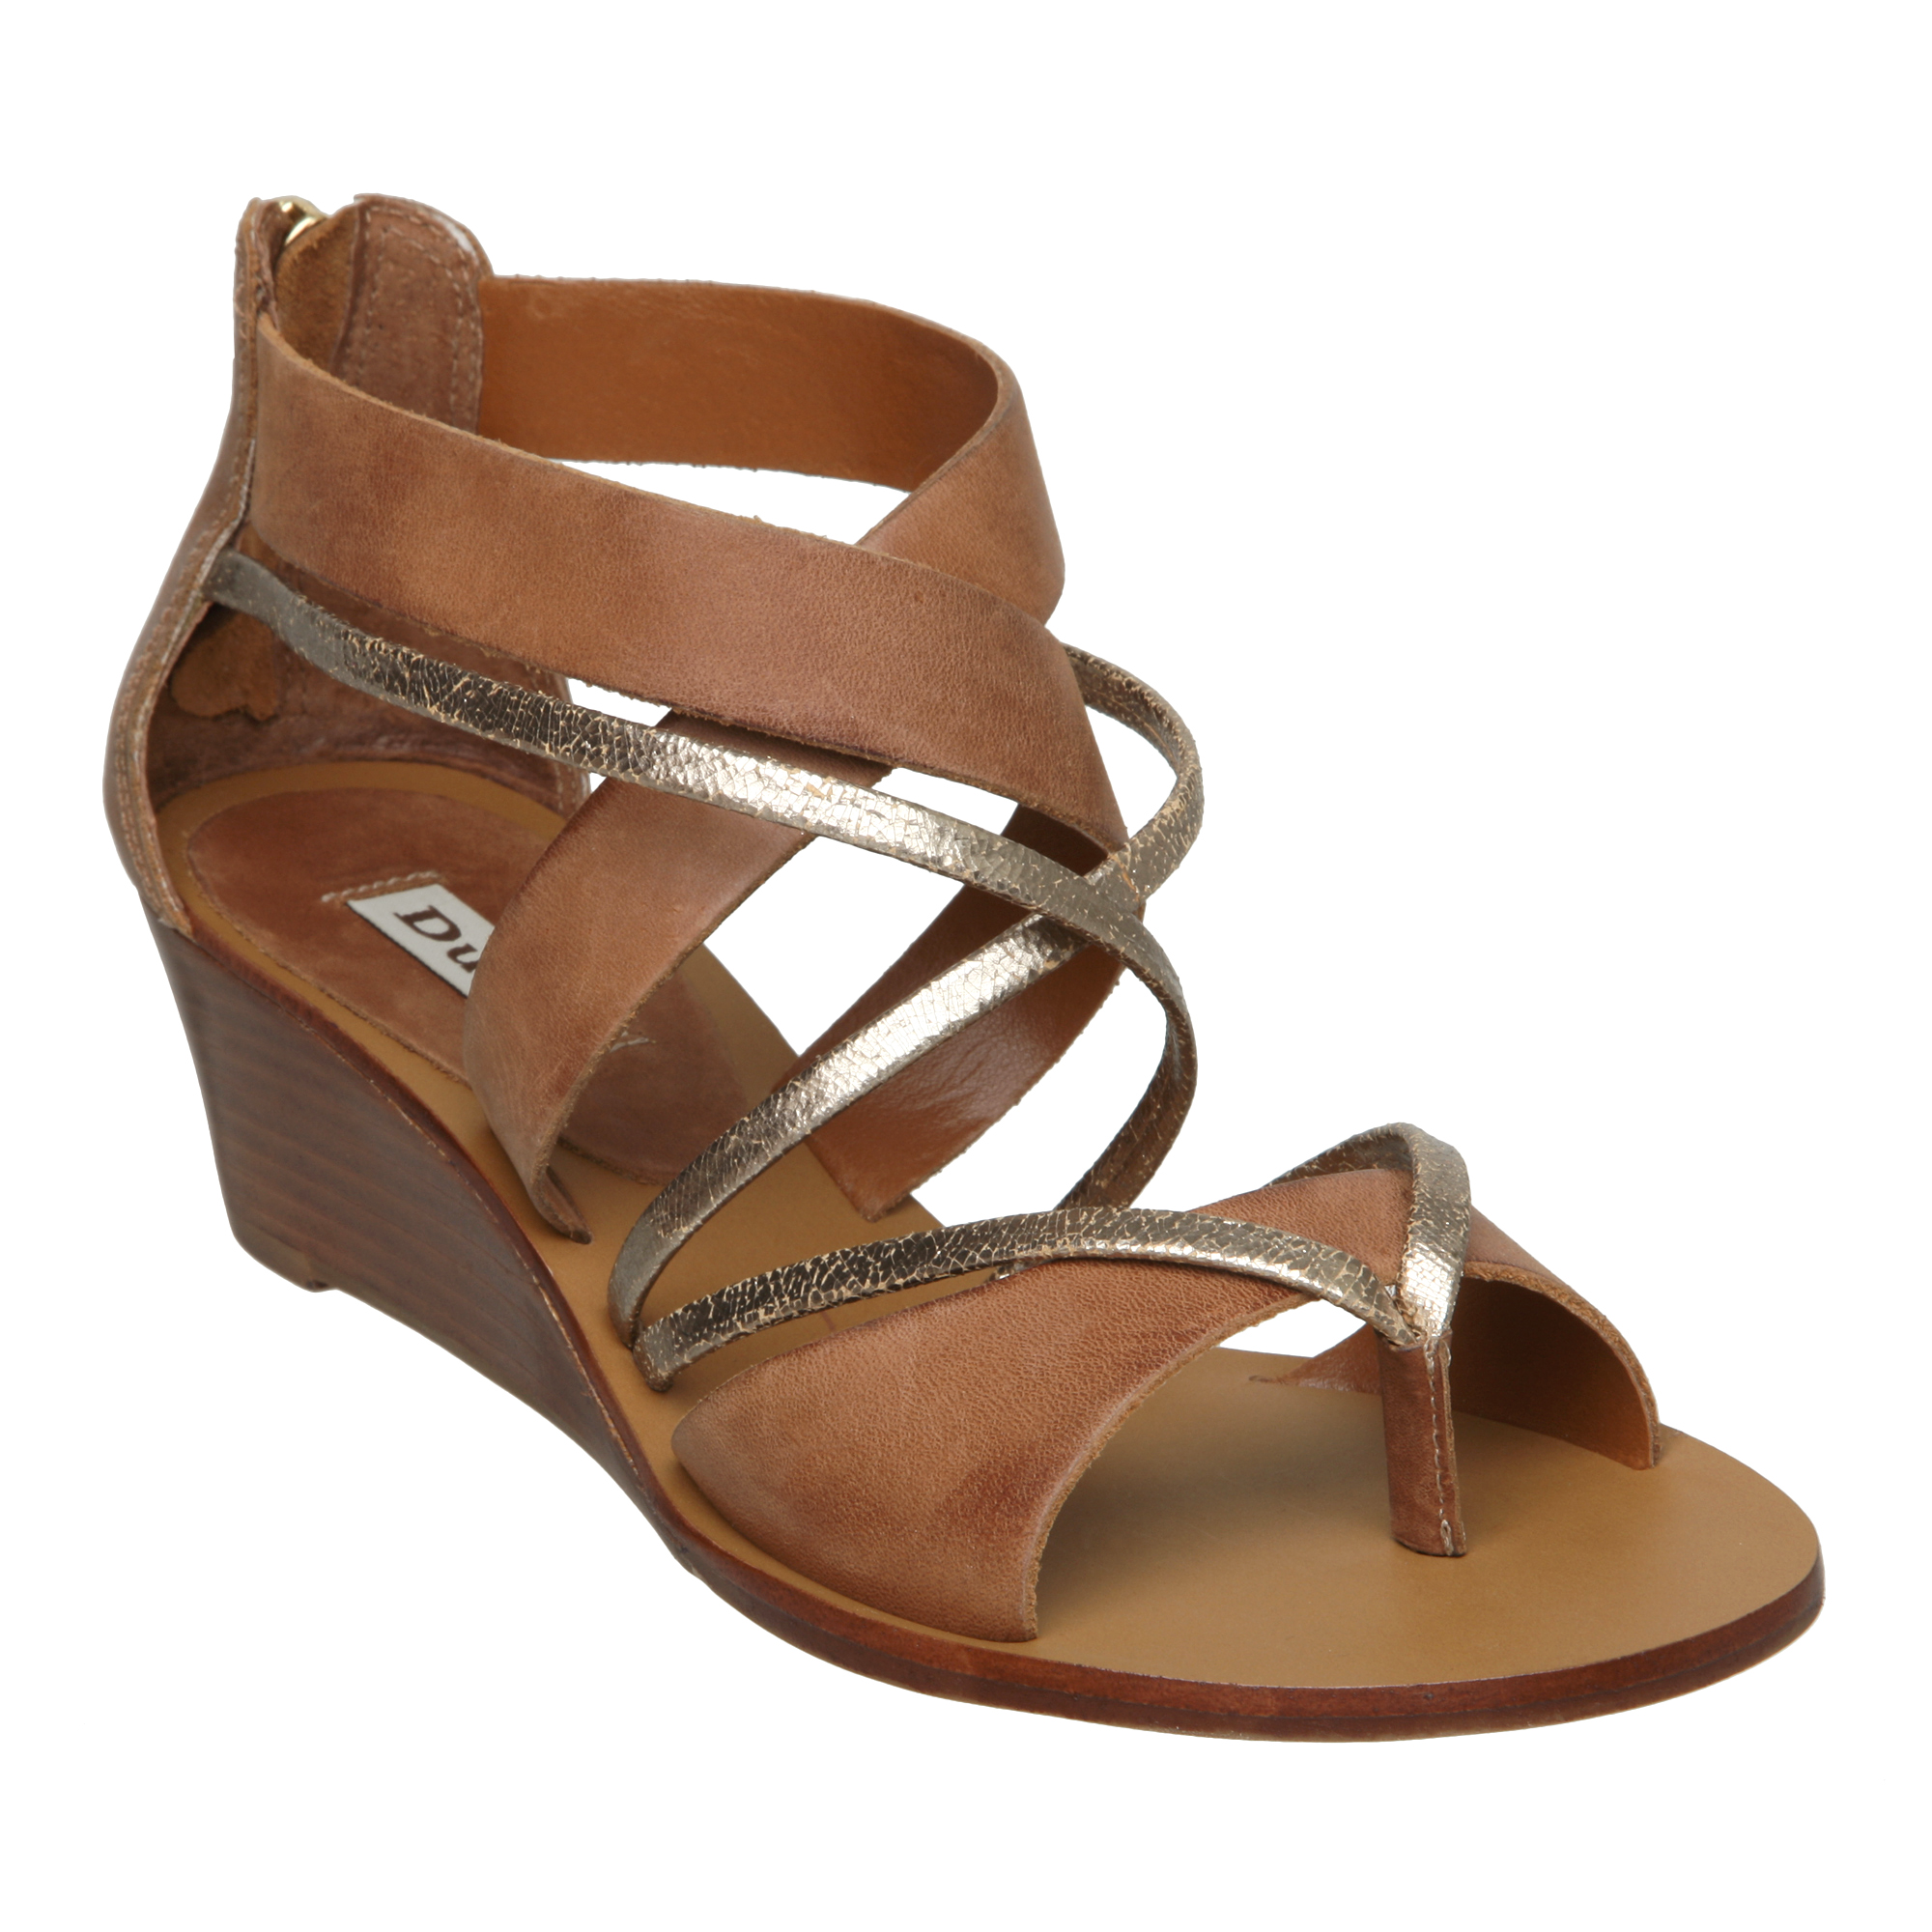 New Dune Ladies Gogo D Womens Gladiator Low Wedge Heel